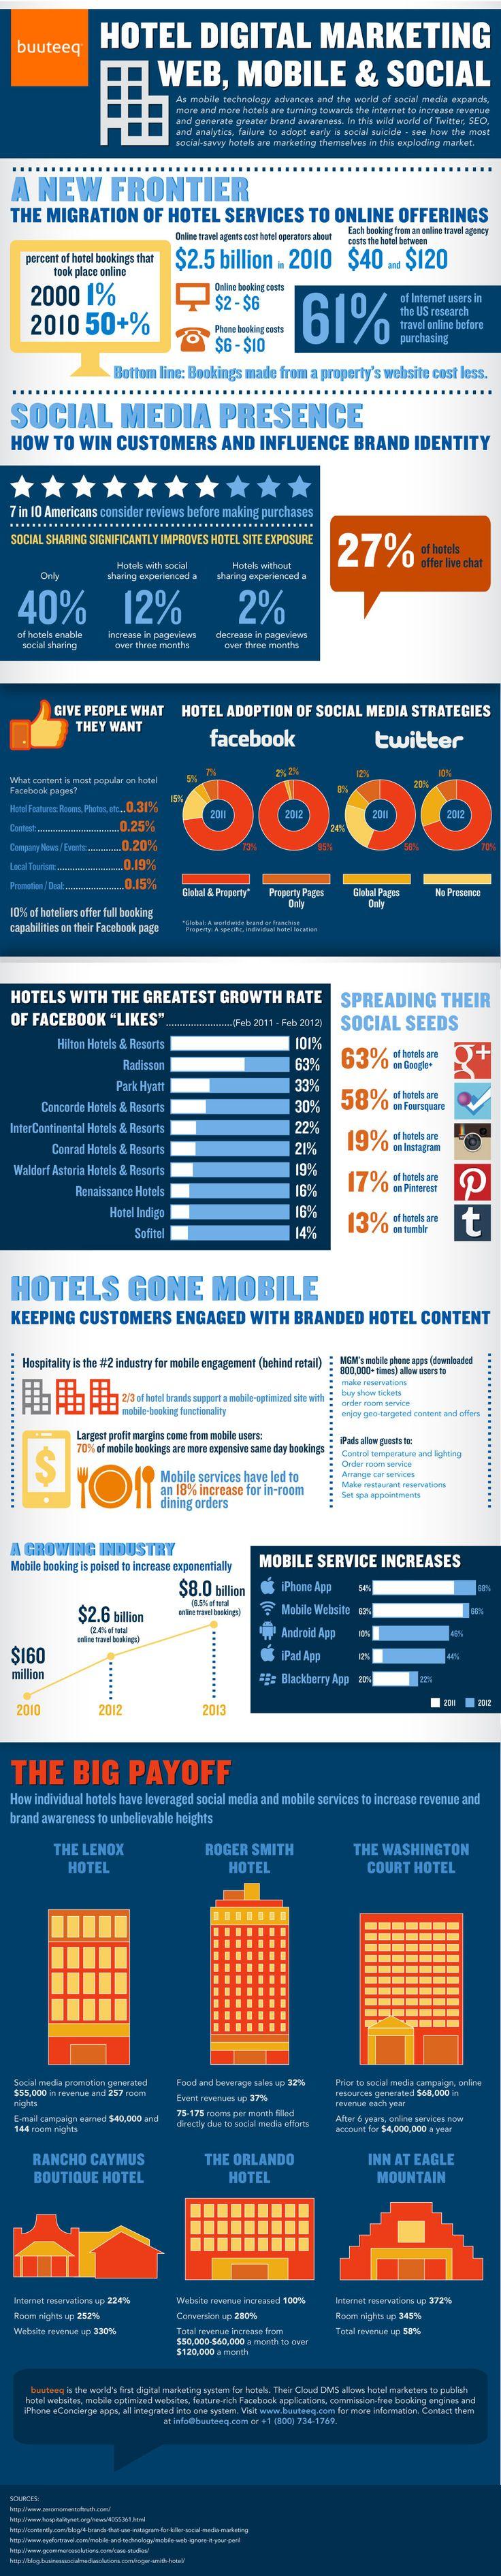 Hotel Digital Marketing , how social media integration & mobile integration will bring more traffic to Hotel business. # Digital Marketing # Social Media Marketing # E Commerce